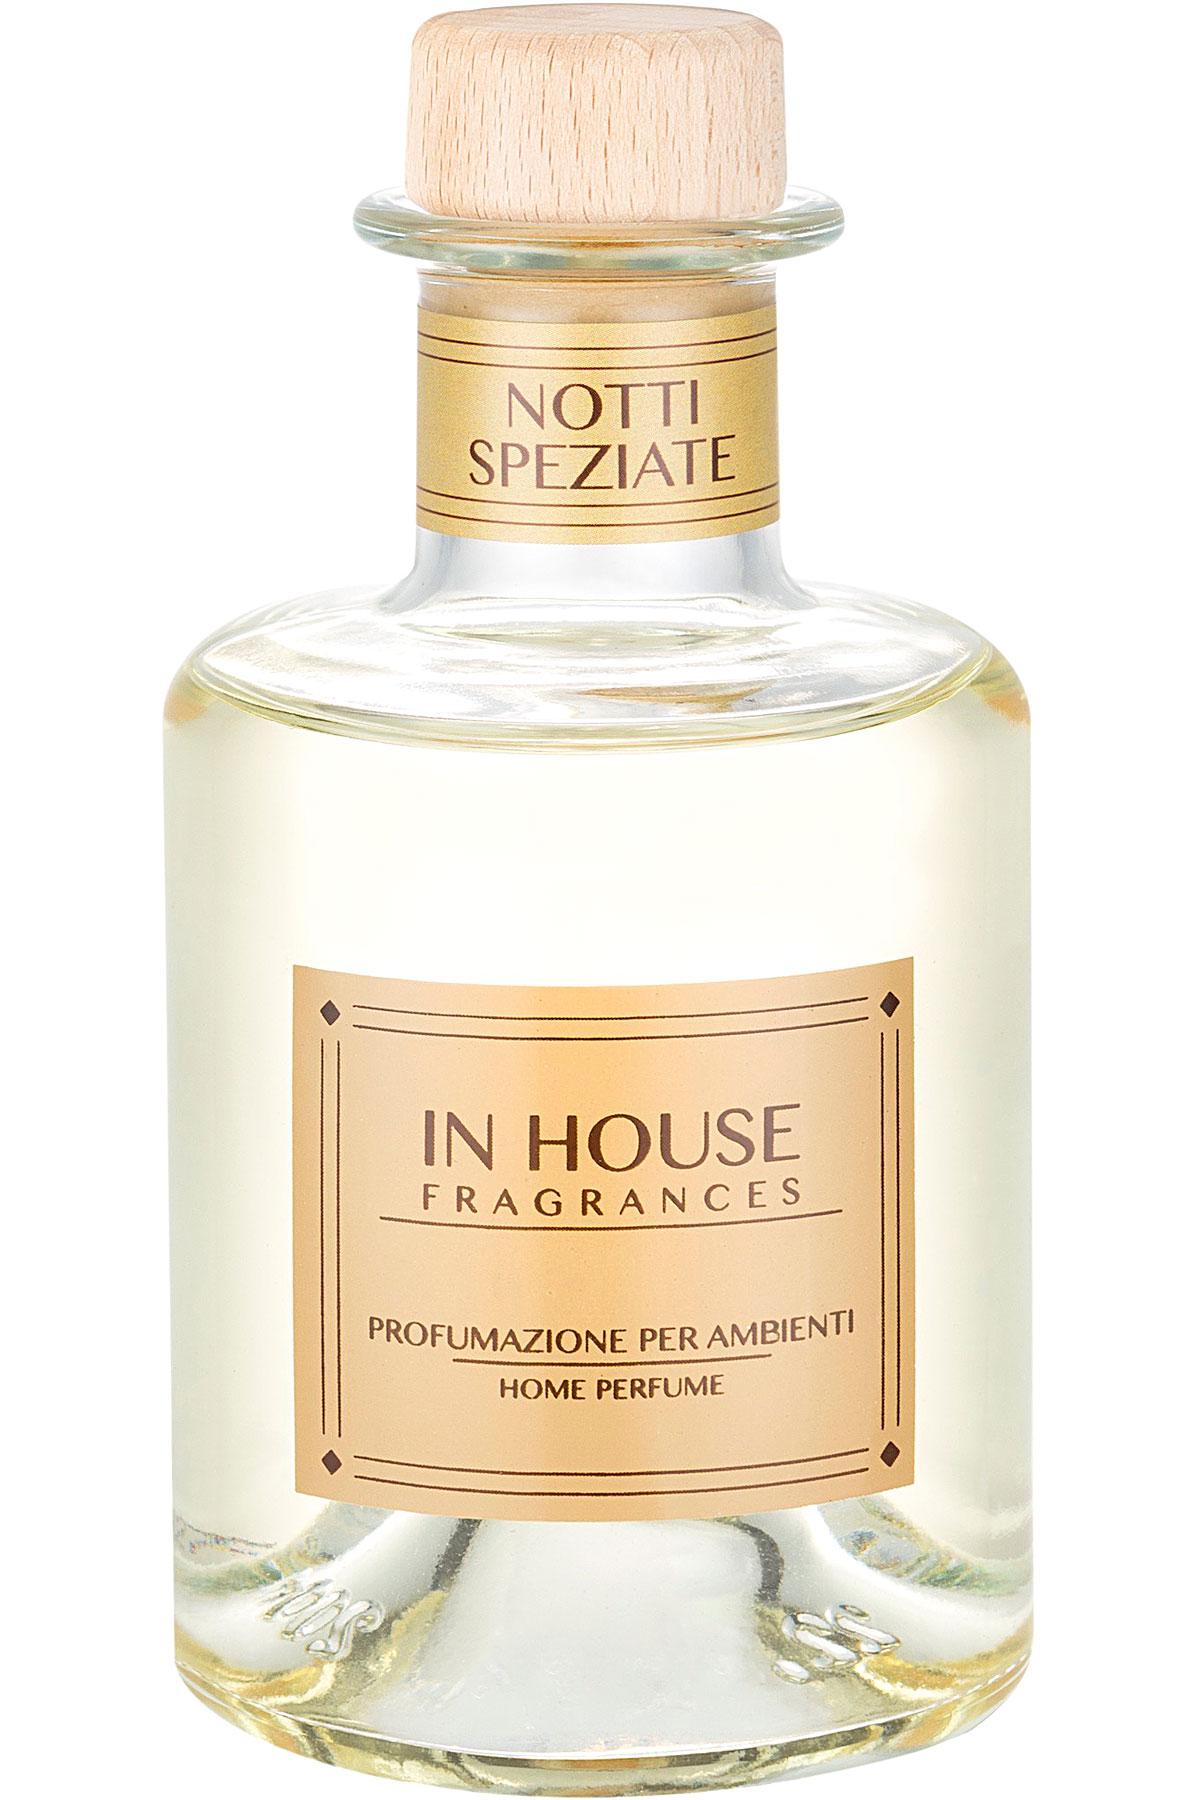 In House Fragrances Home Scents for Men, Notti Speziate - Home Diffuser - 200 Ml, 2019, 200 ml